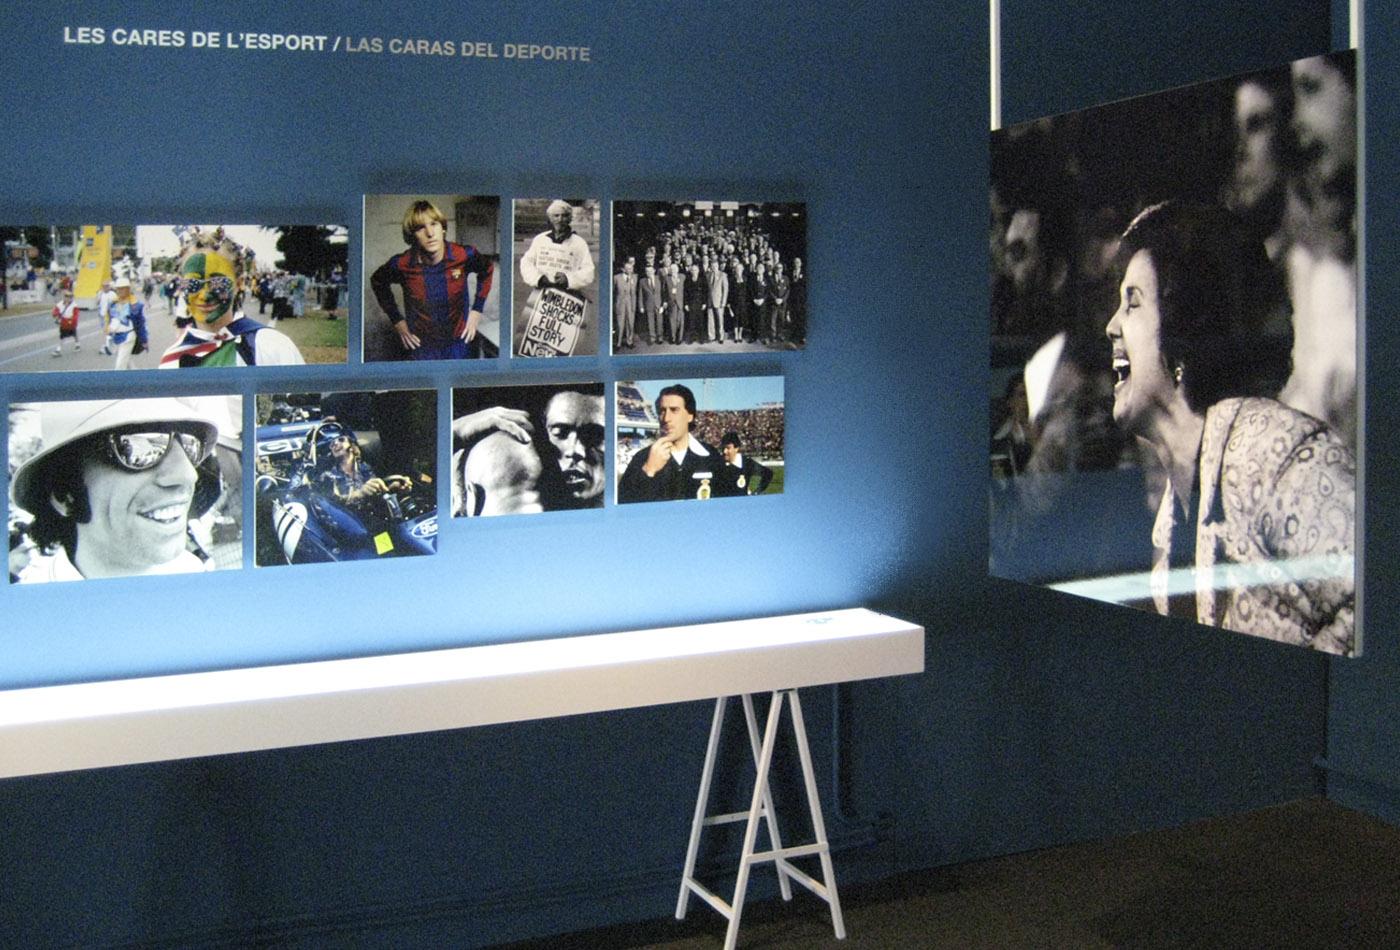 avelino-pi-sports-exposicio-deporte-creartiva-disseny-caixaforum